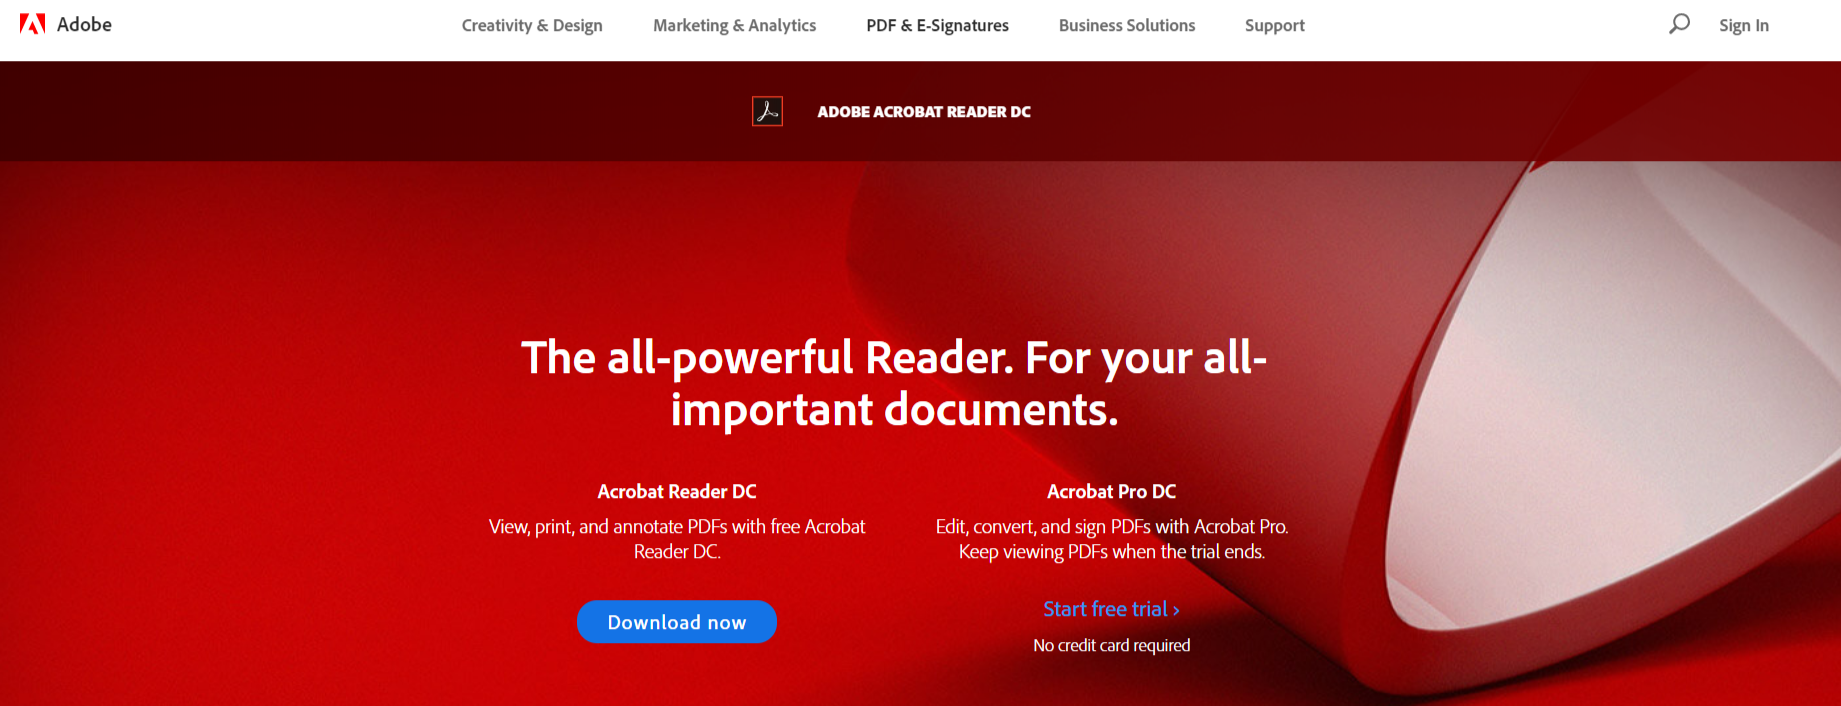 Adobe Acrobat Reader- PDF Reader for Windows OS